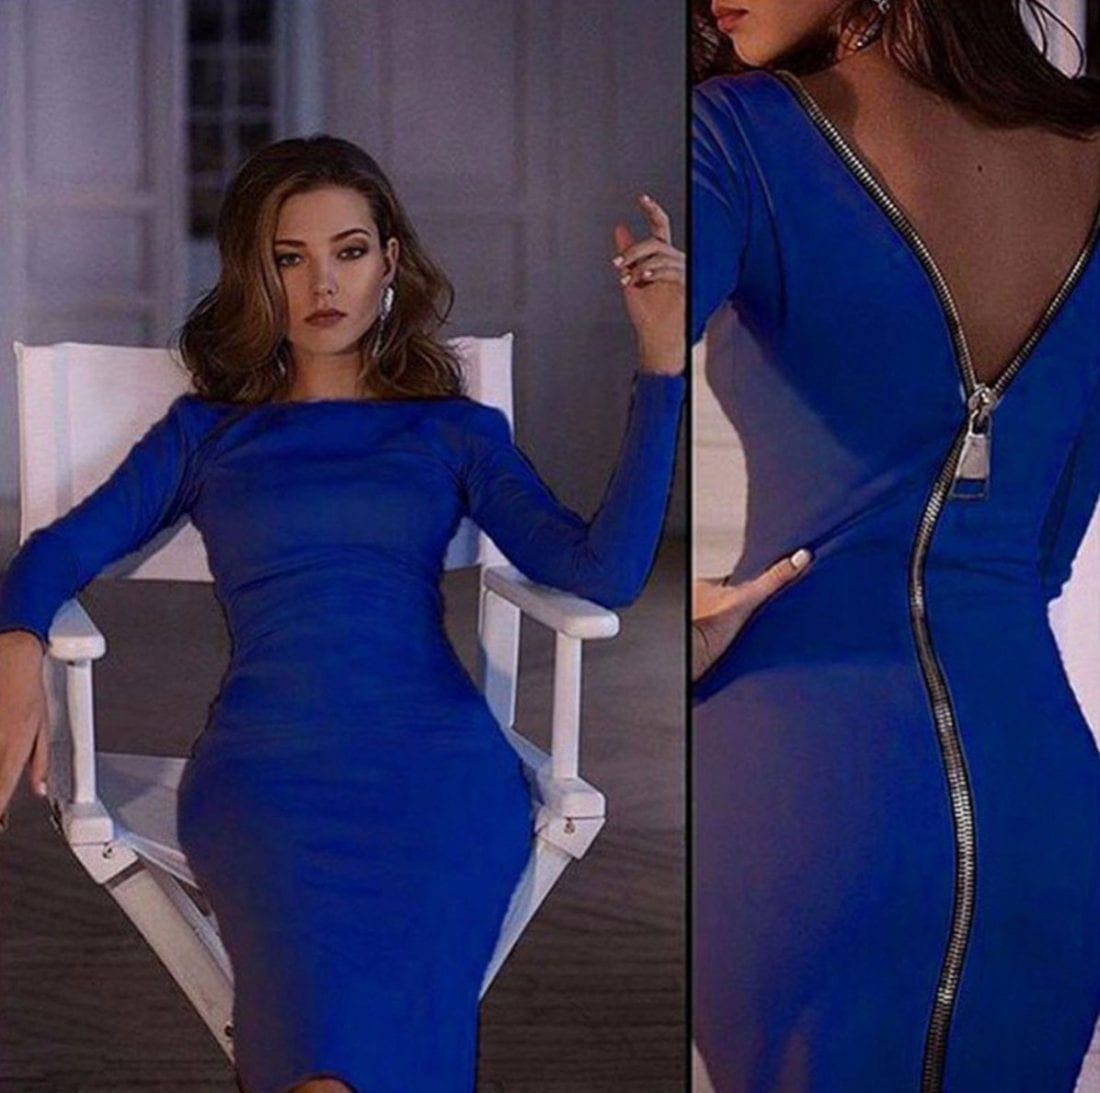 M0185 blue6 Office Evening Dresses maureens.com boutique